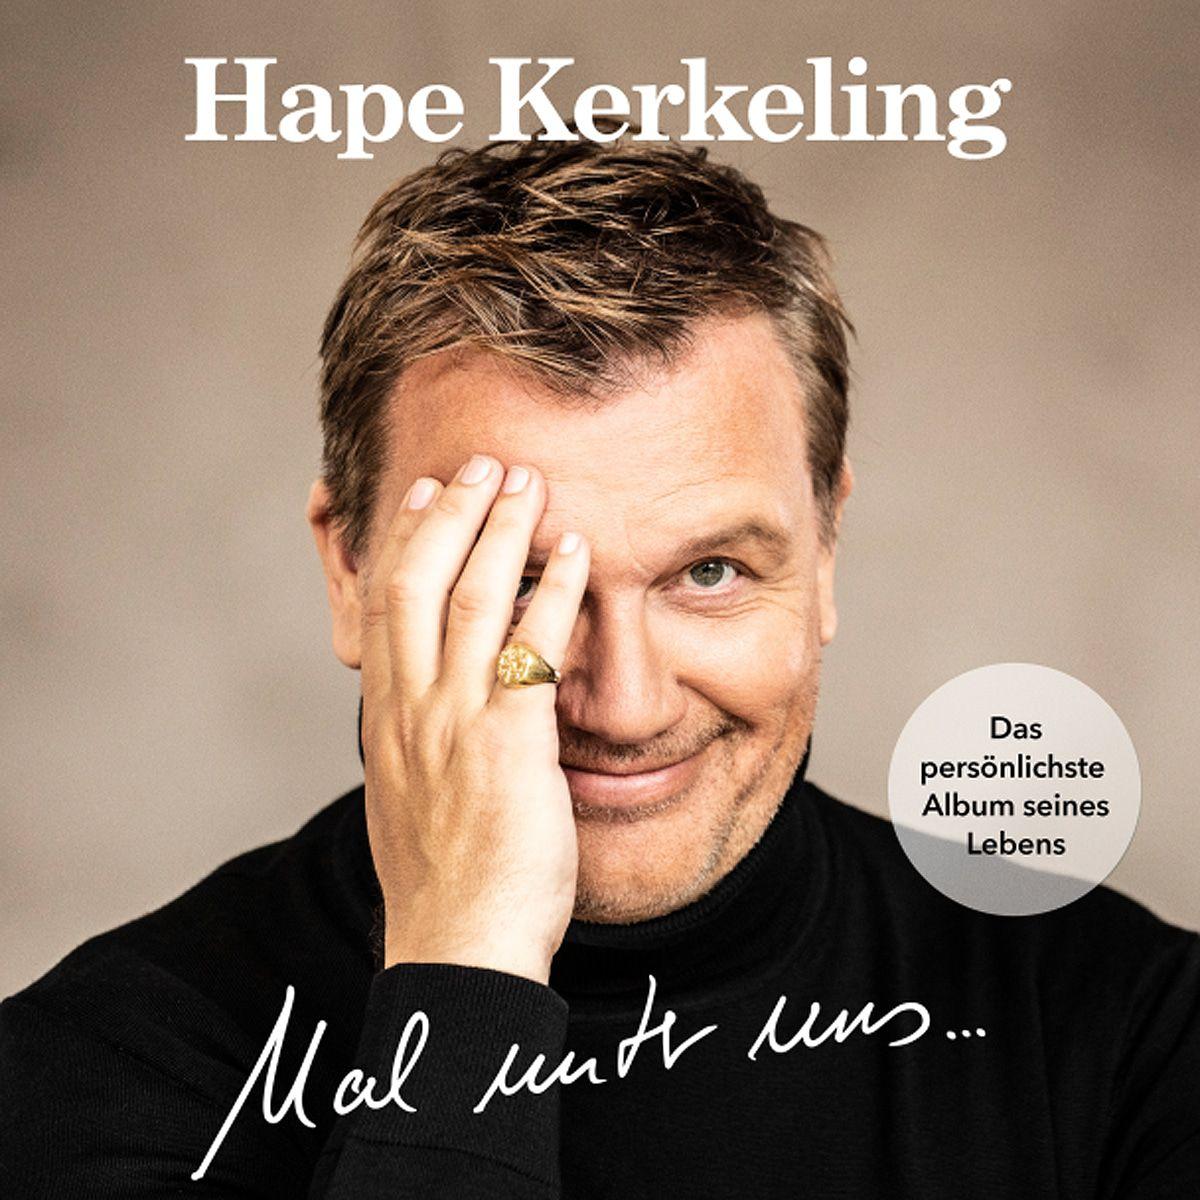 Hape Kerkeling veröffentlicht neues Album!